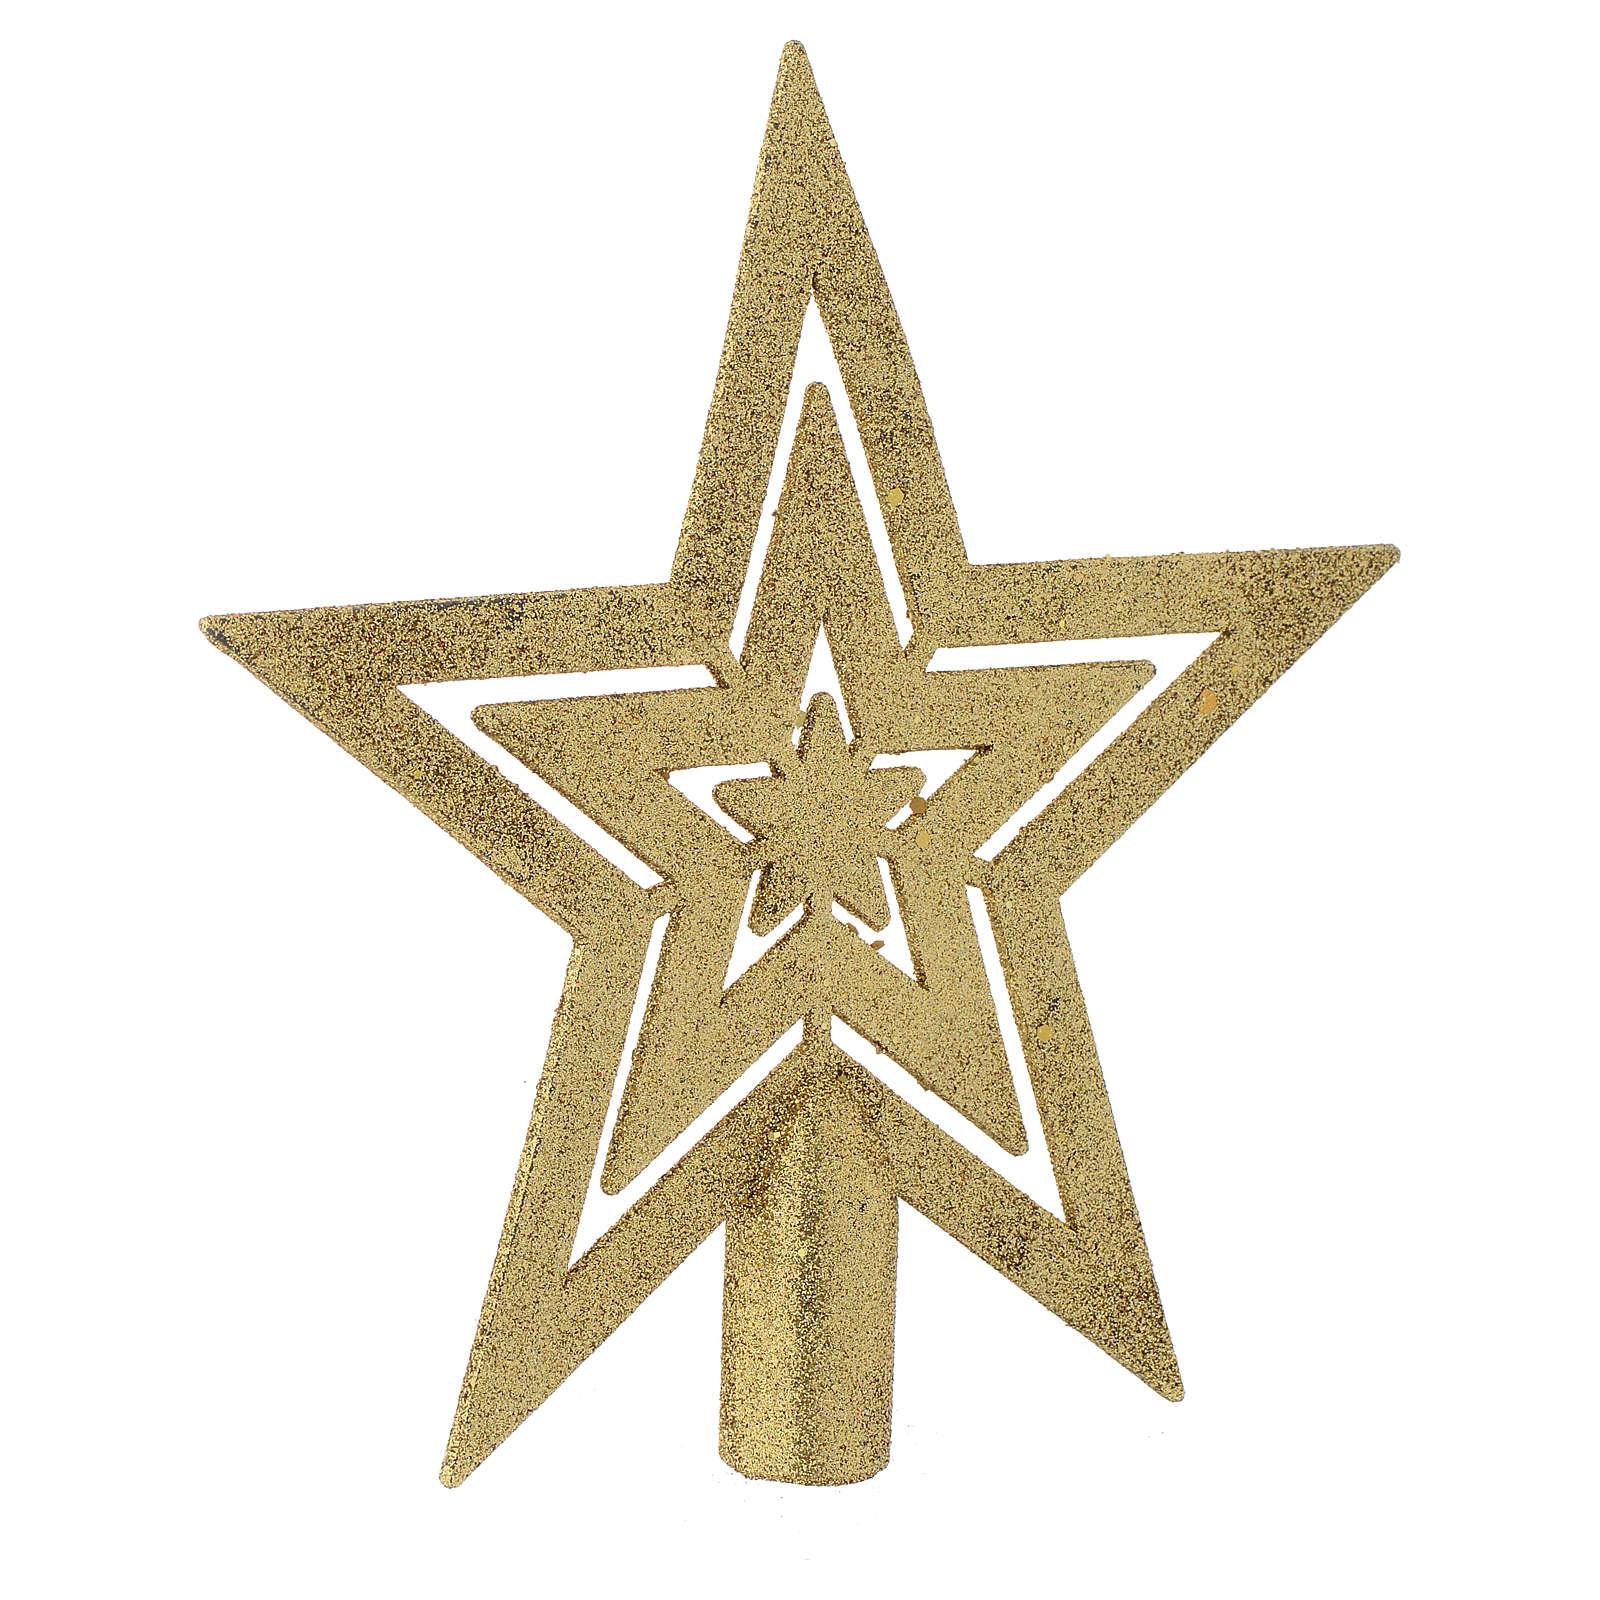 Christmas Tree star shaped topper, golden colour 4